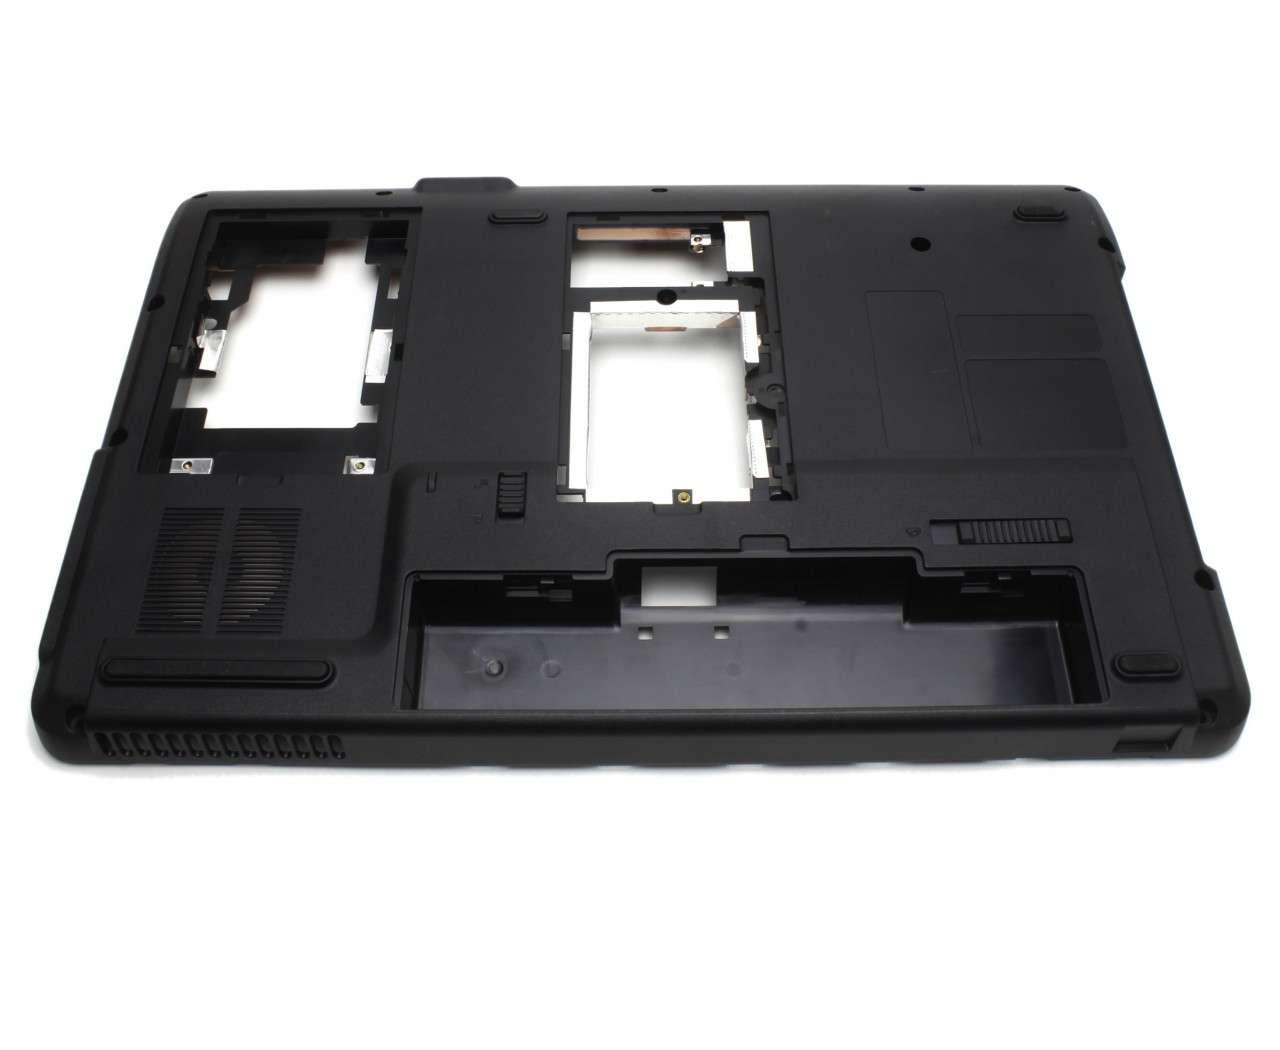 Bottom Case Emachines E627 Carcasa Inferioara Neagra imagine powerlaptop.ro 2021